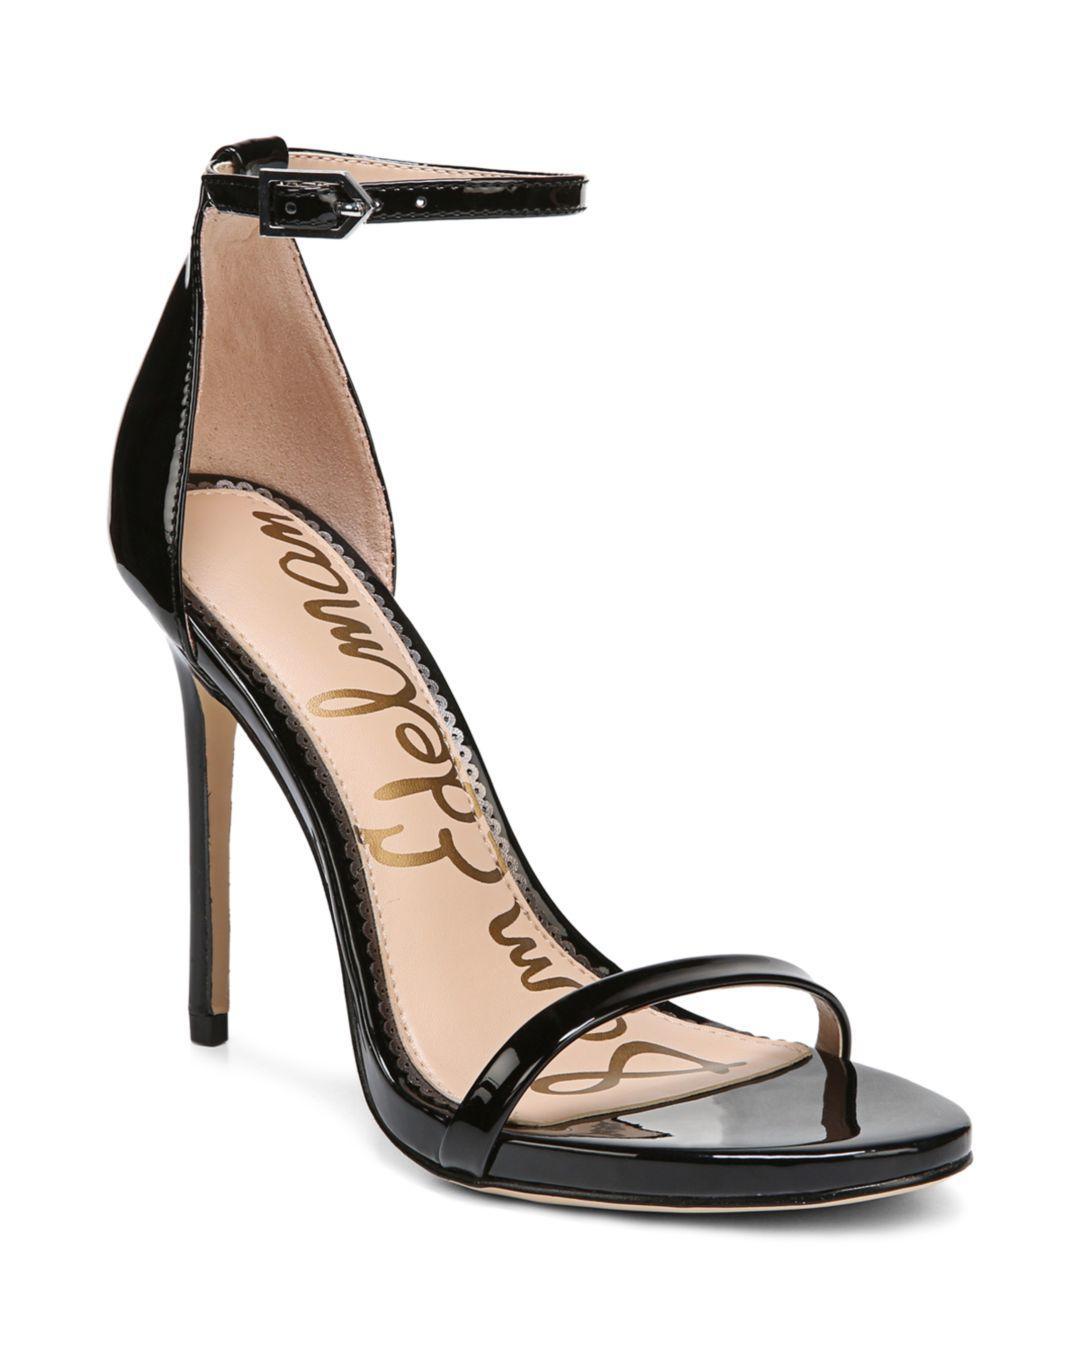 fb57c6042c3 Lyst - Sam Edelman Women s Ariella High-heel Ankle Strap Sandals in ...